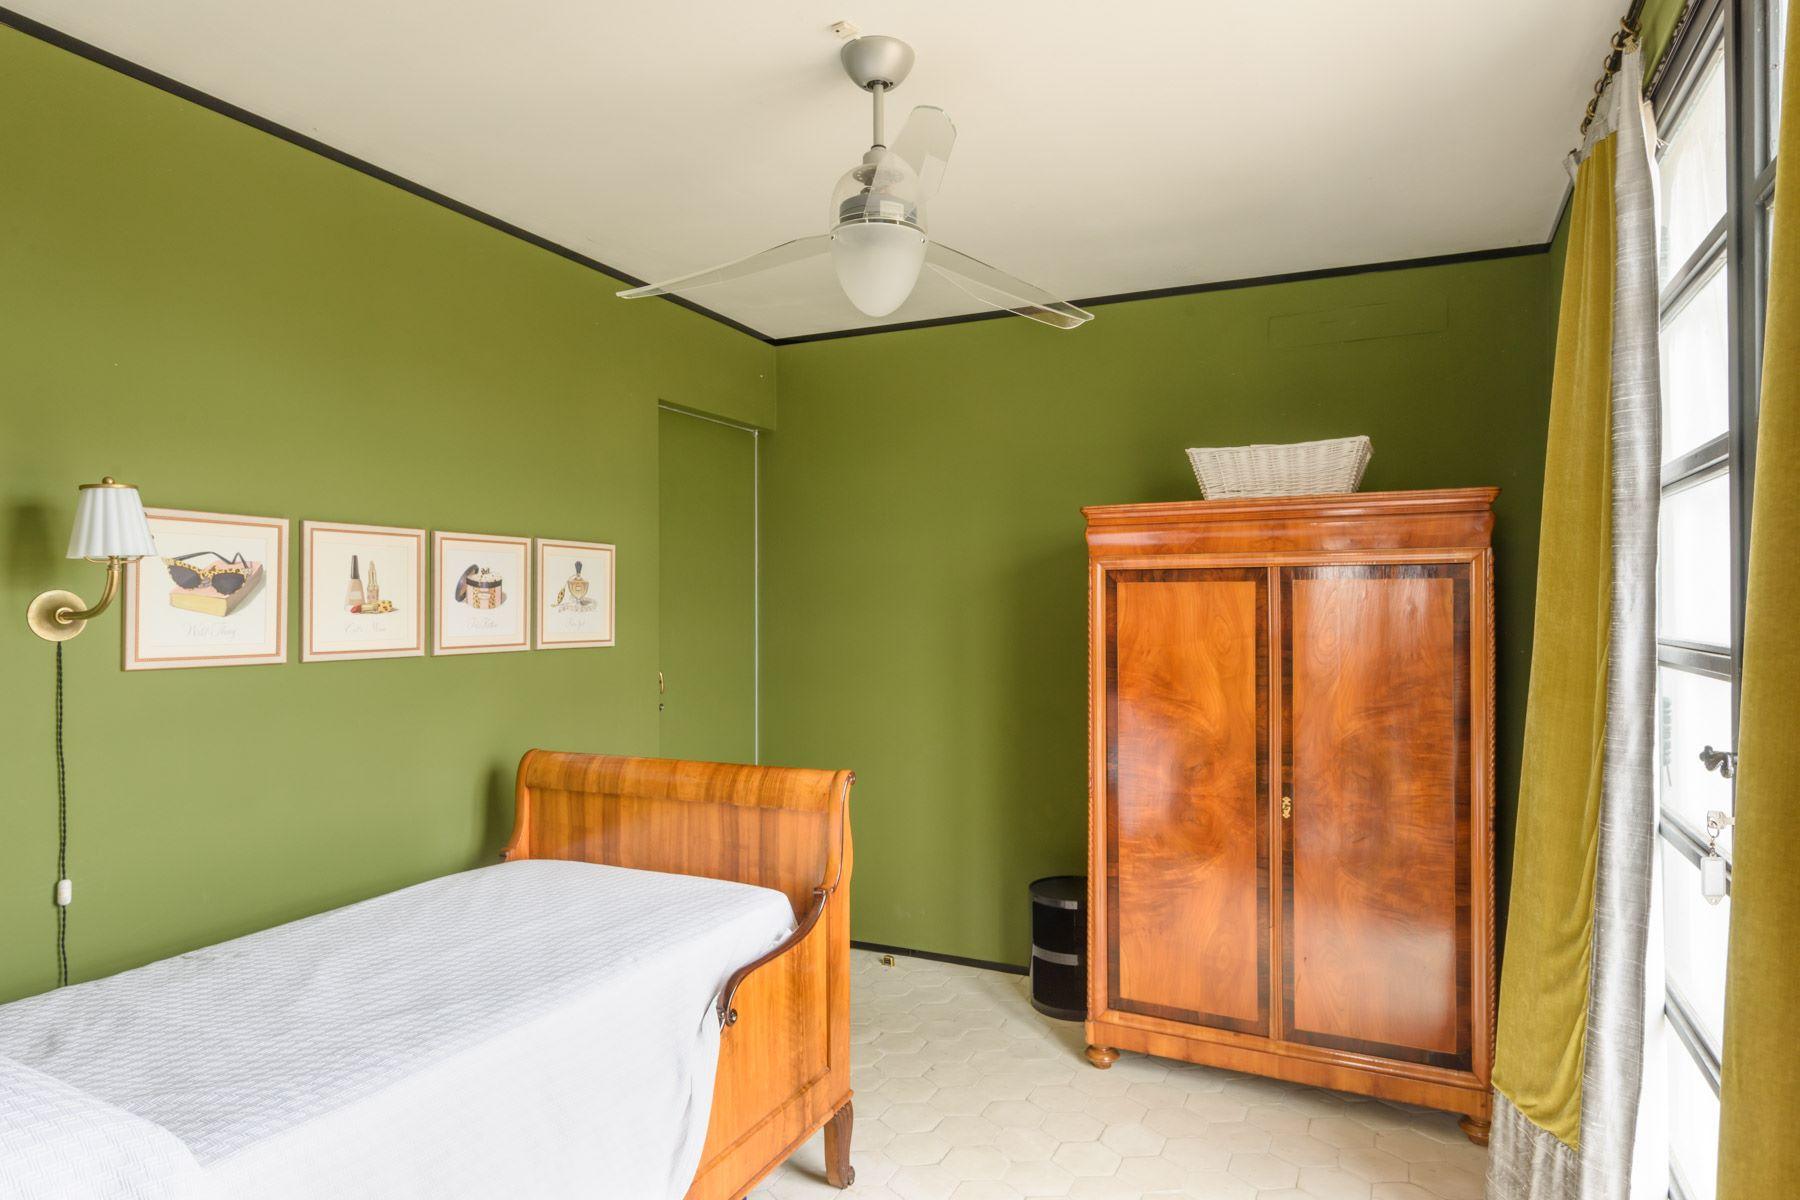 Additional photo for property listing at Splendid modern villa nestled on Umbrian hills Gaglietole Collazzone, Perugia 06050 Italia